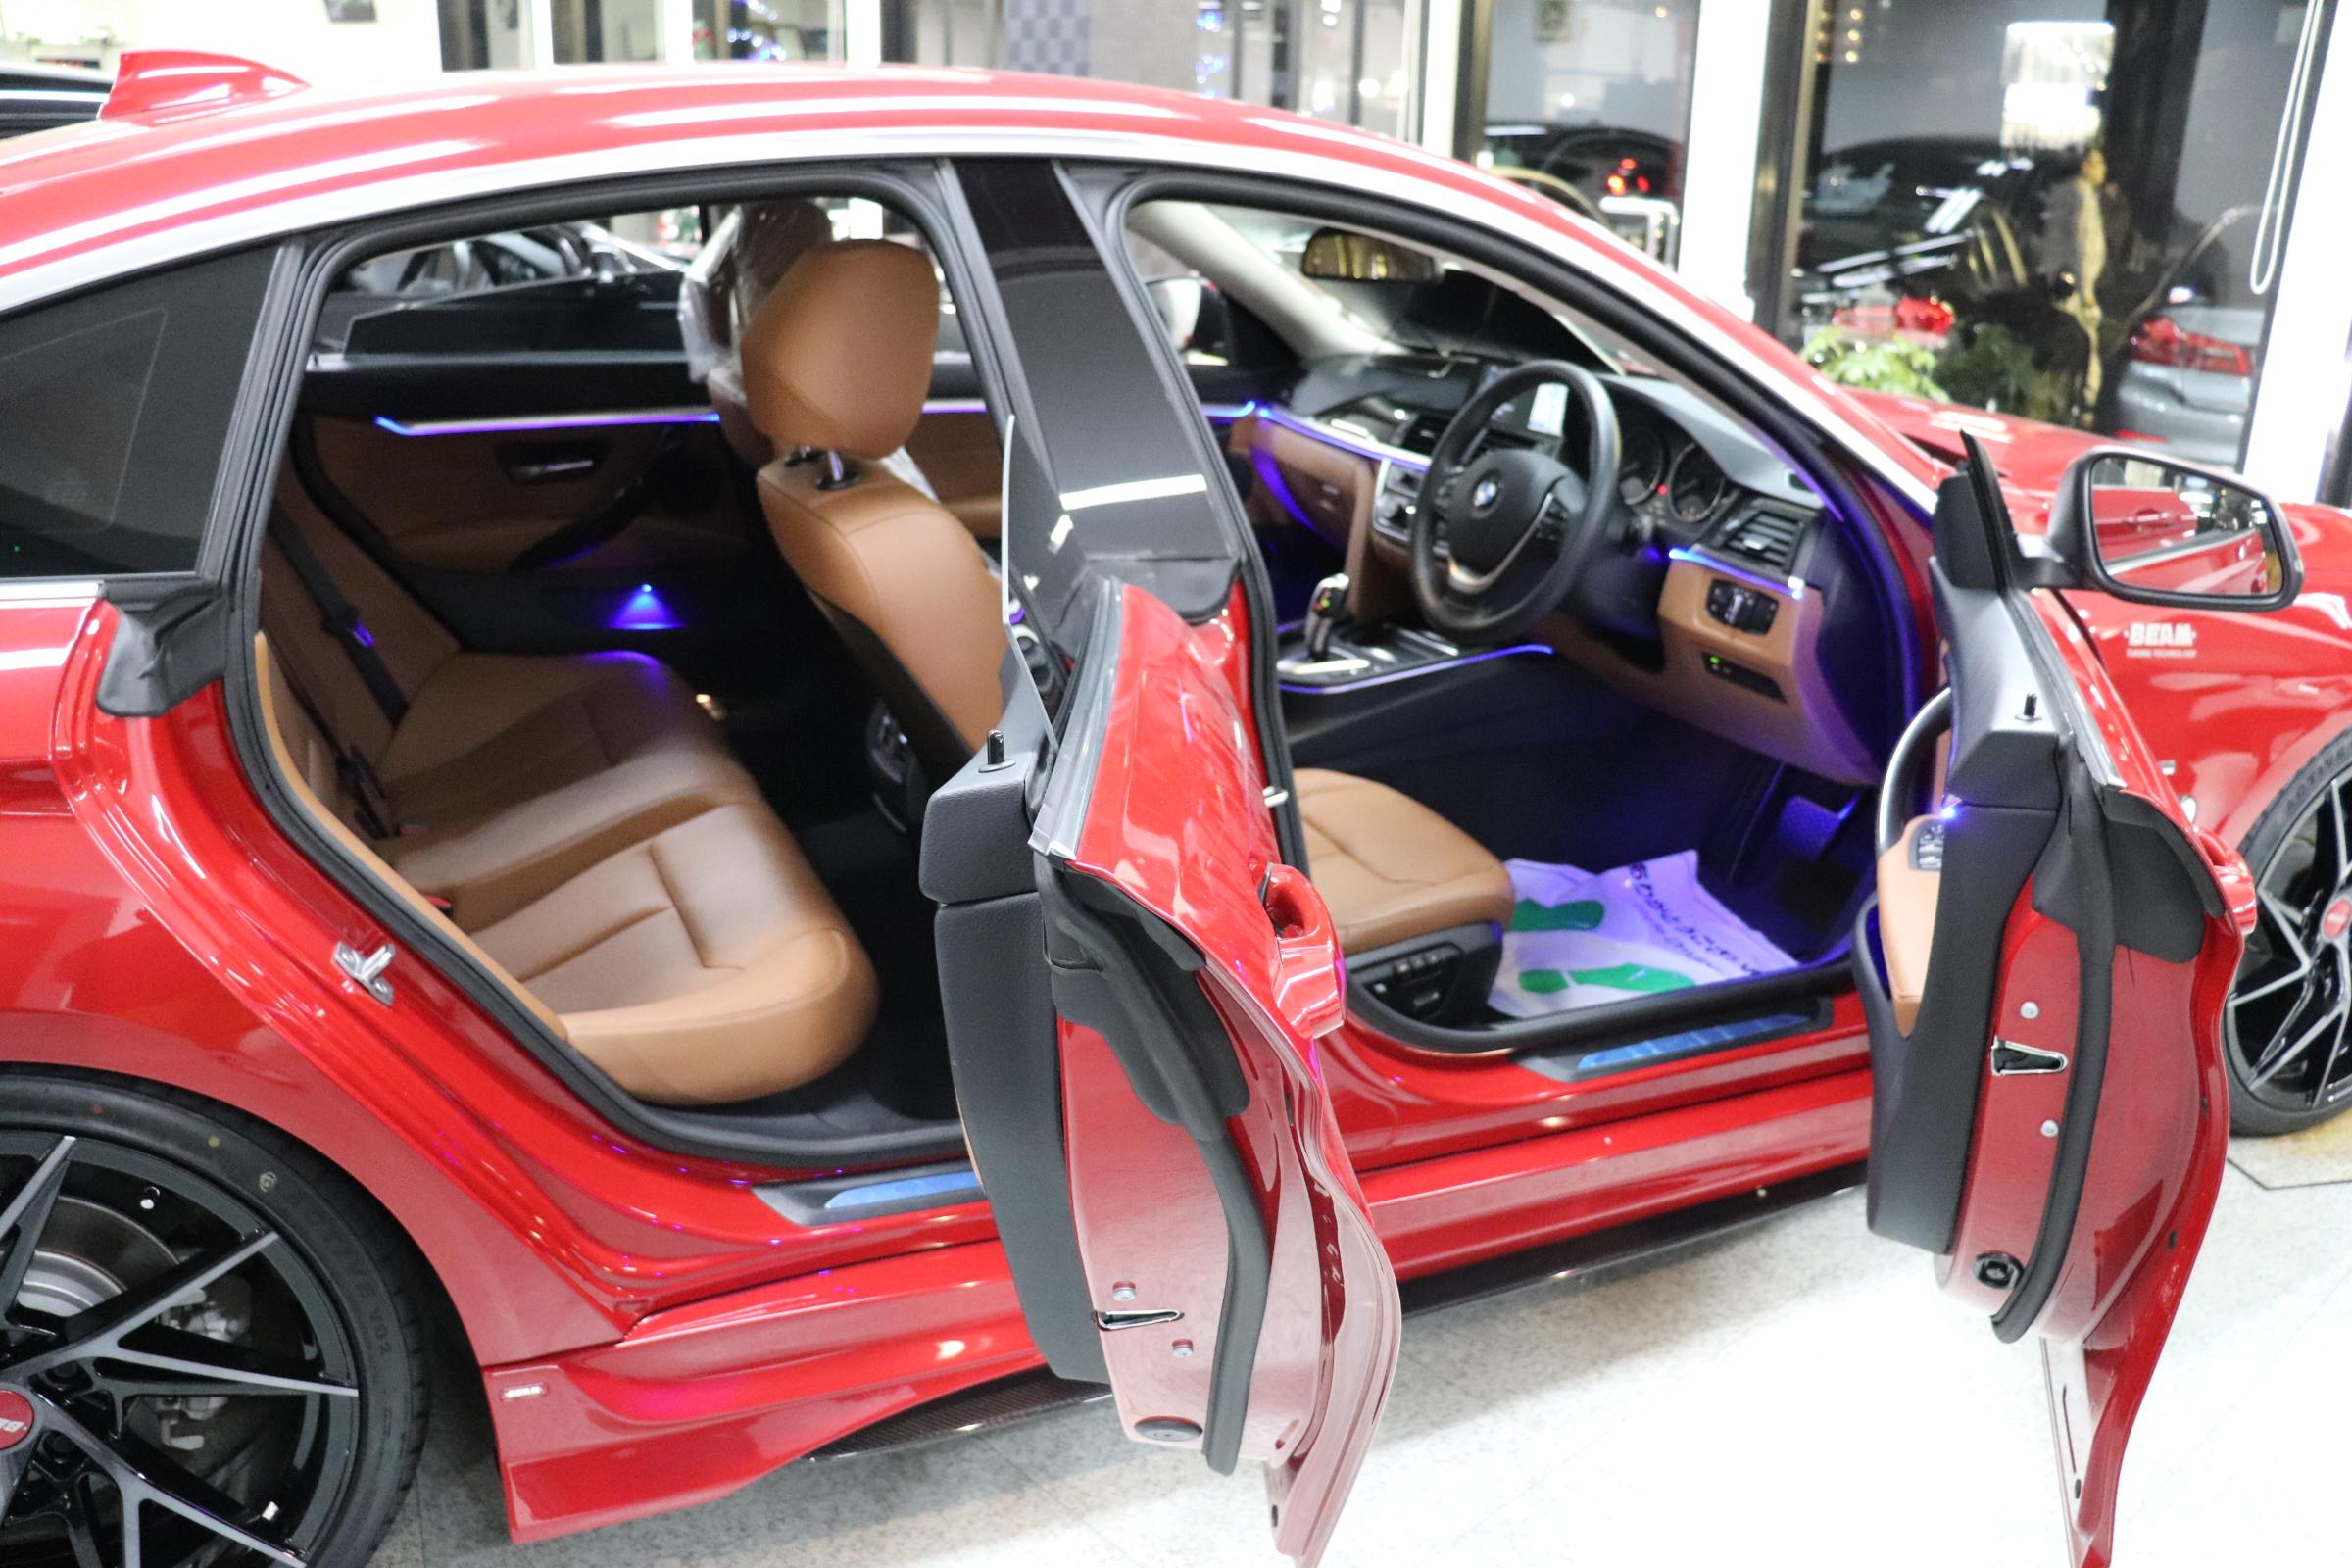 420iグランクーペラグジュアリーBEAMコンプリートカー 茶革 LEDヘッドライト車両画像15